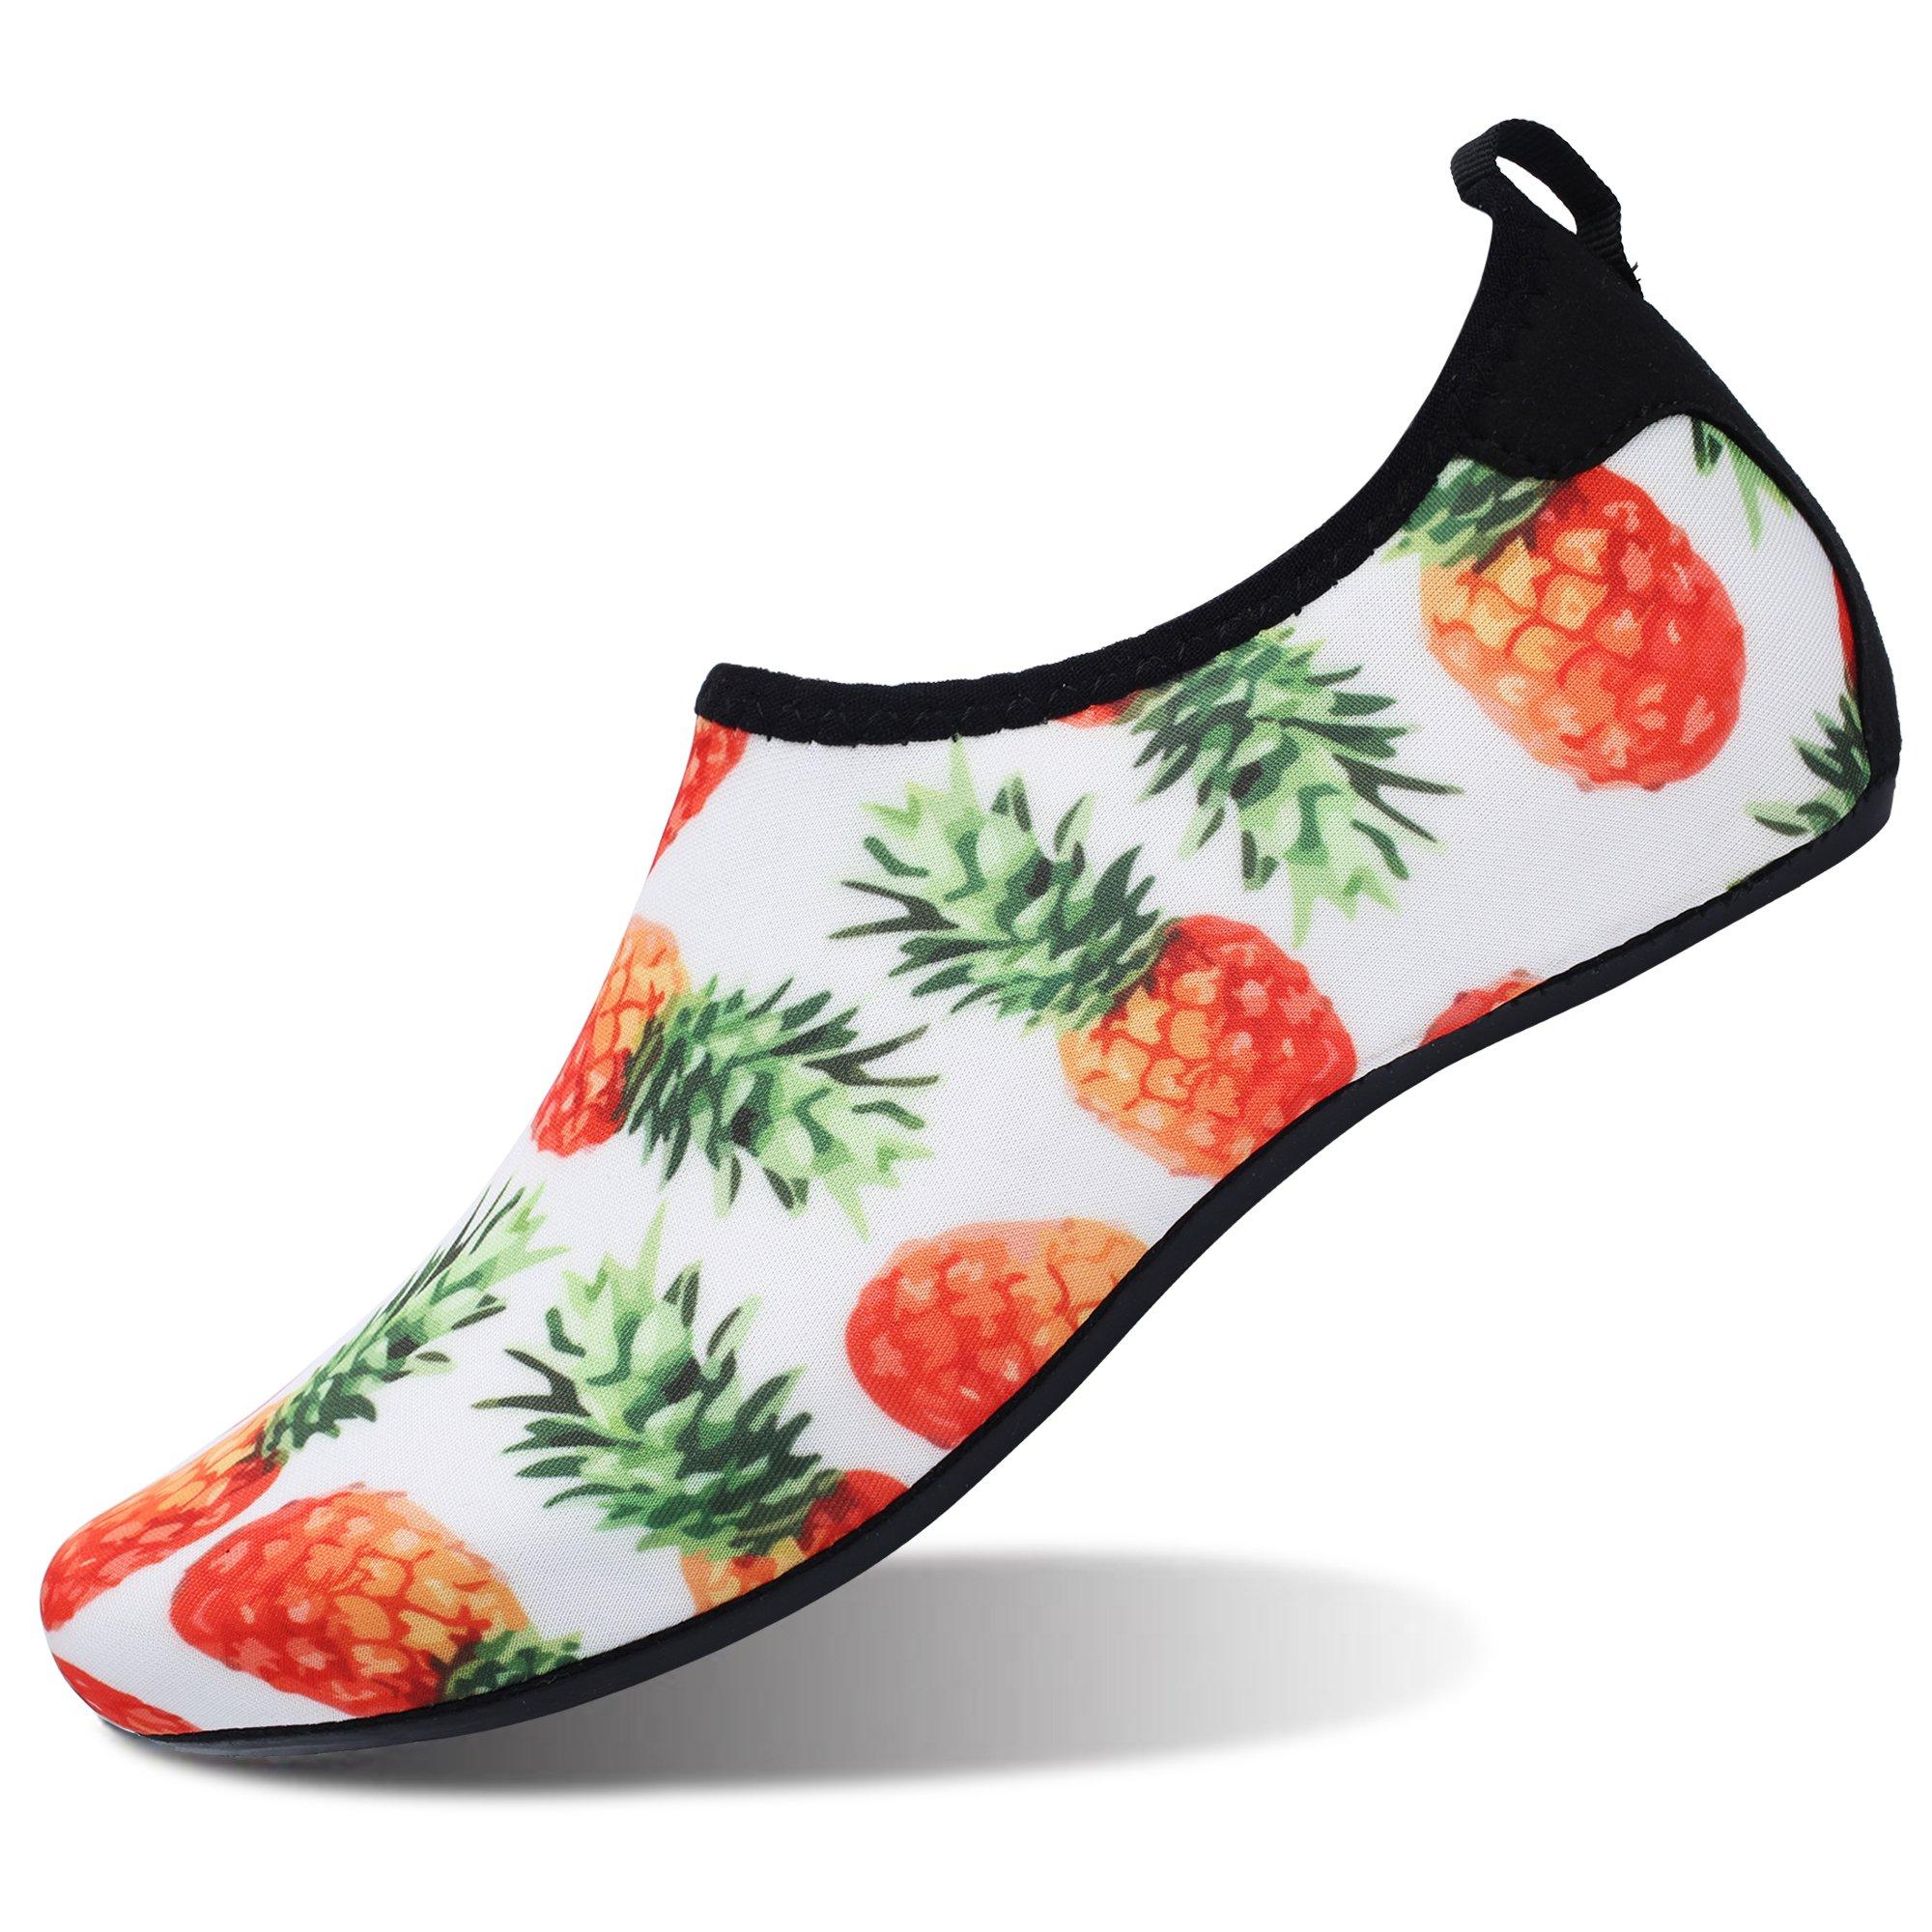 FEETCITY Men Women Water Shoes Multifunctional Quick-Dry Barefoot Beach Swim Shoes M(W:7.5-8.5,M:6-7)